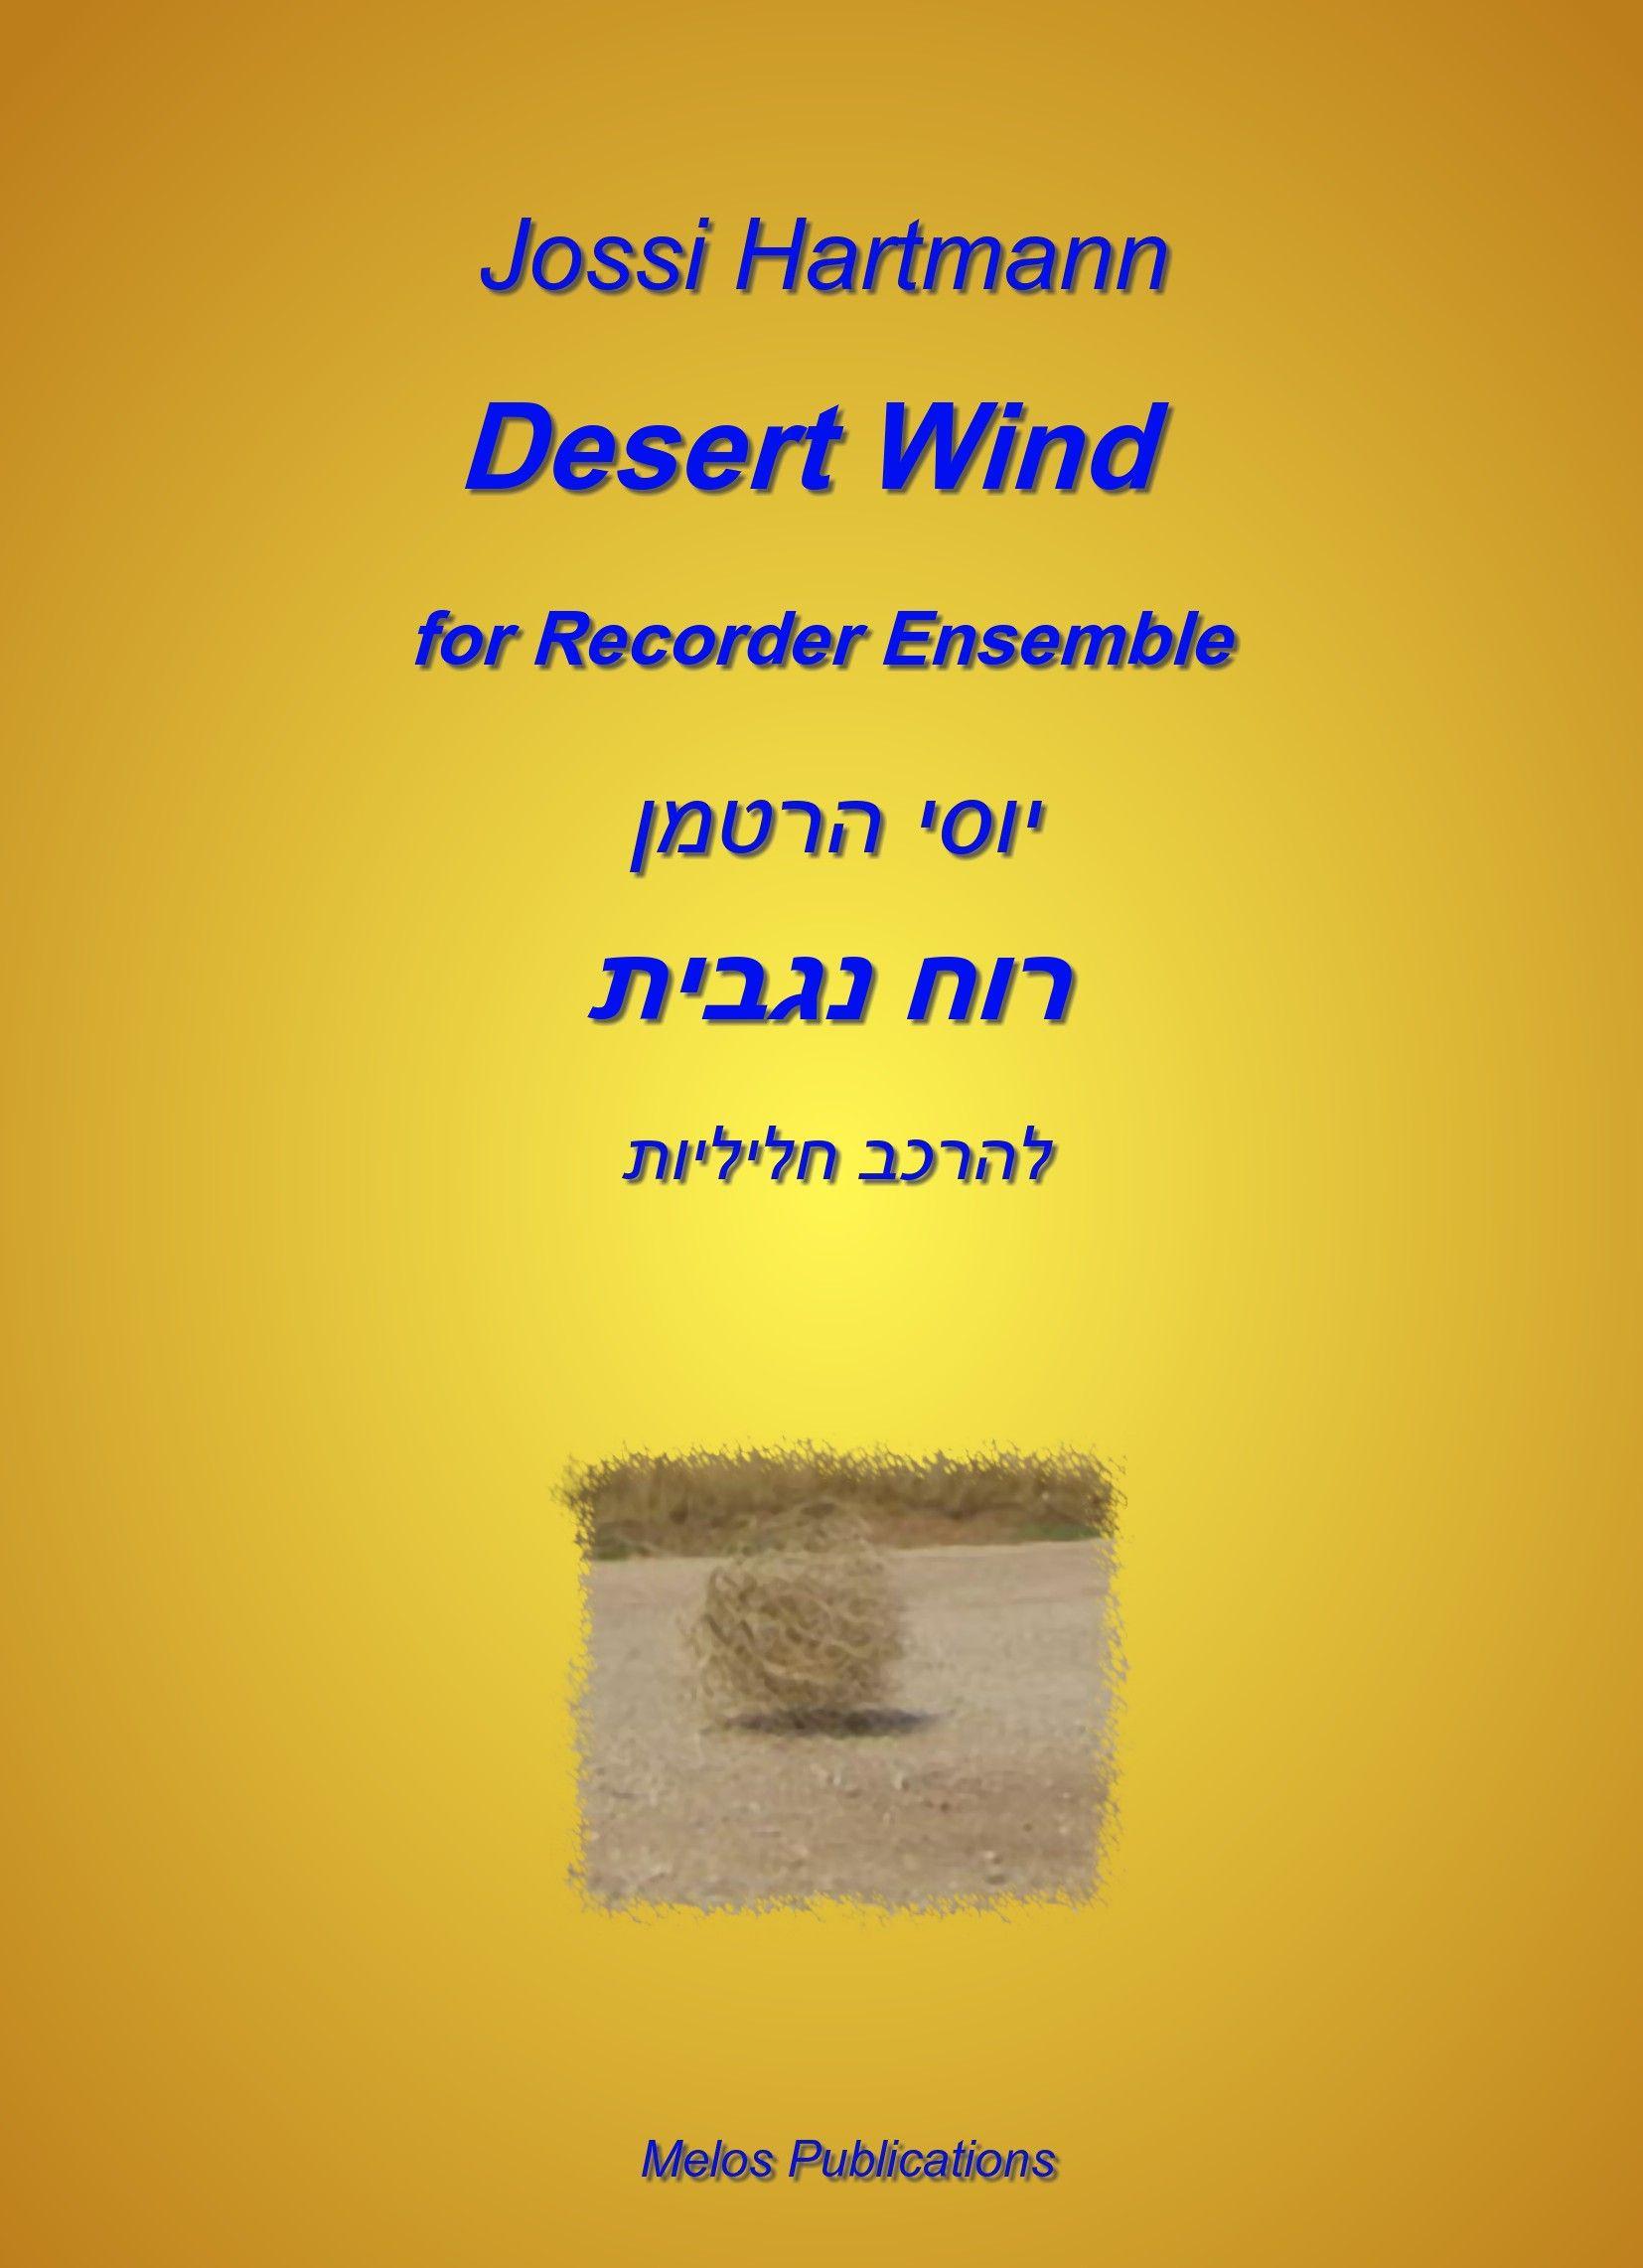 Hartmann, Joseph: Desert Wind